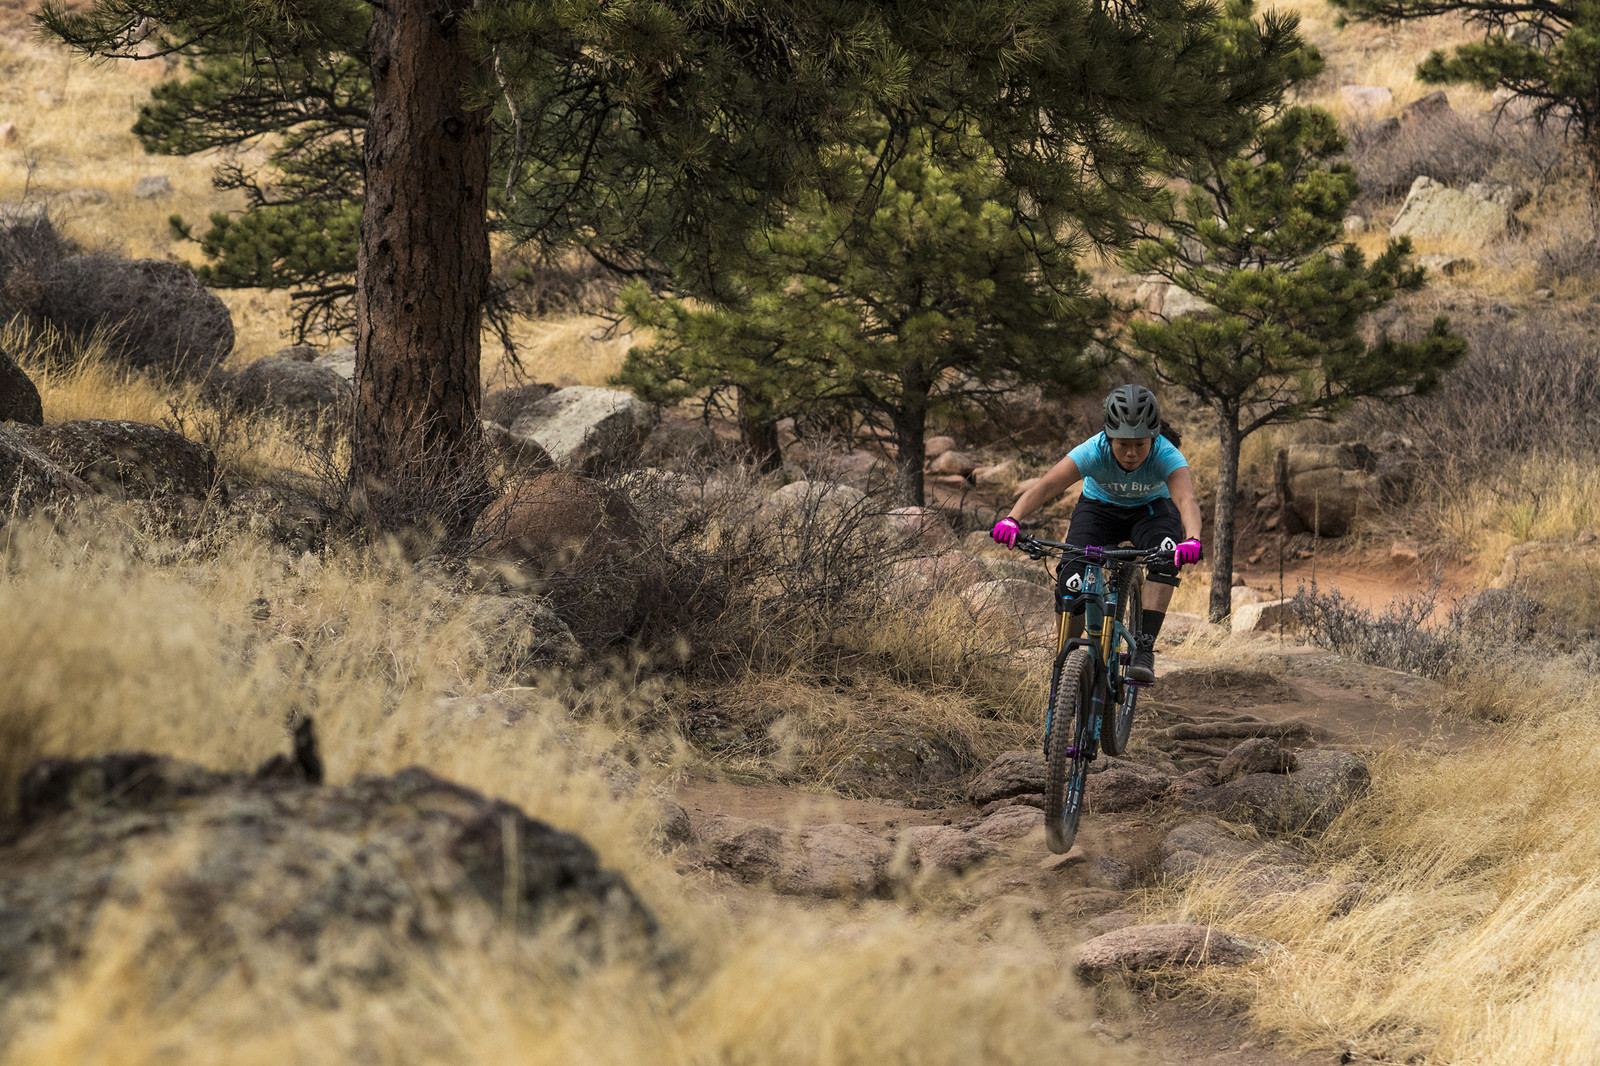 Airing through Rocks - gold_007 - Mountain Biking Pictures - Vital MTB